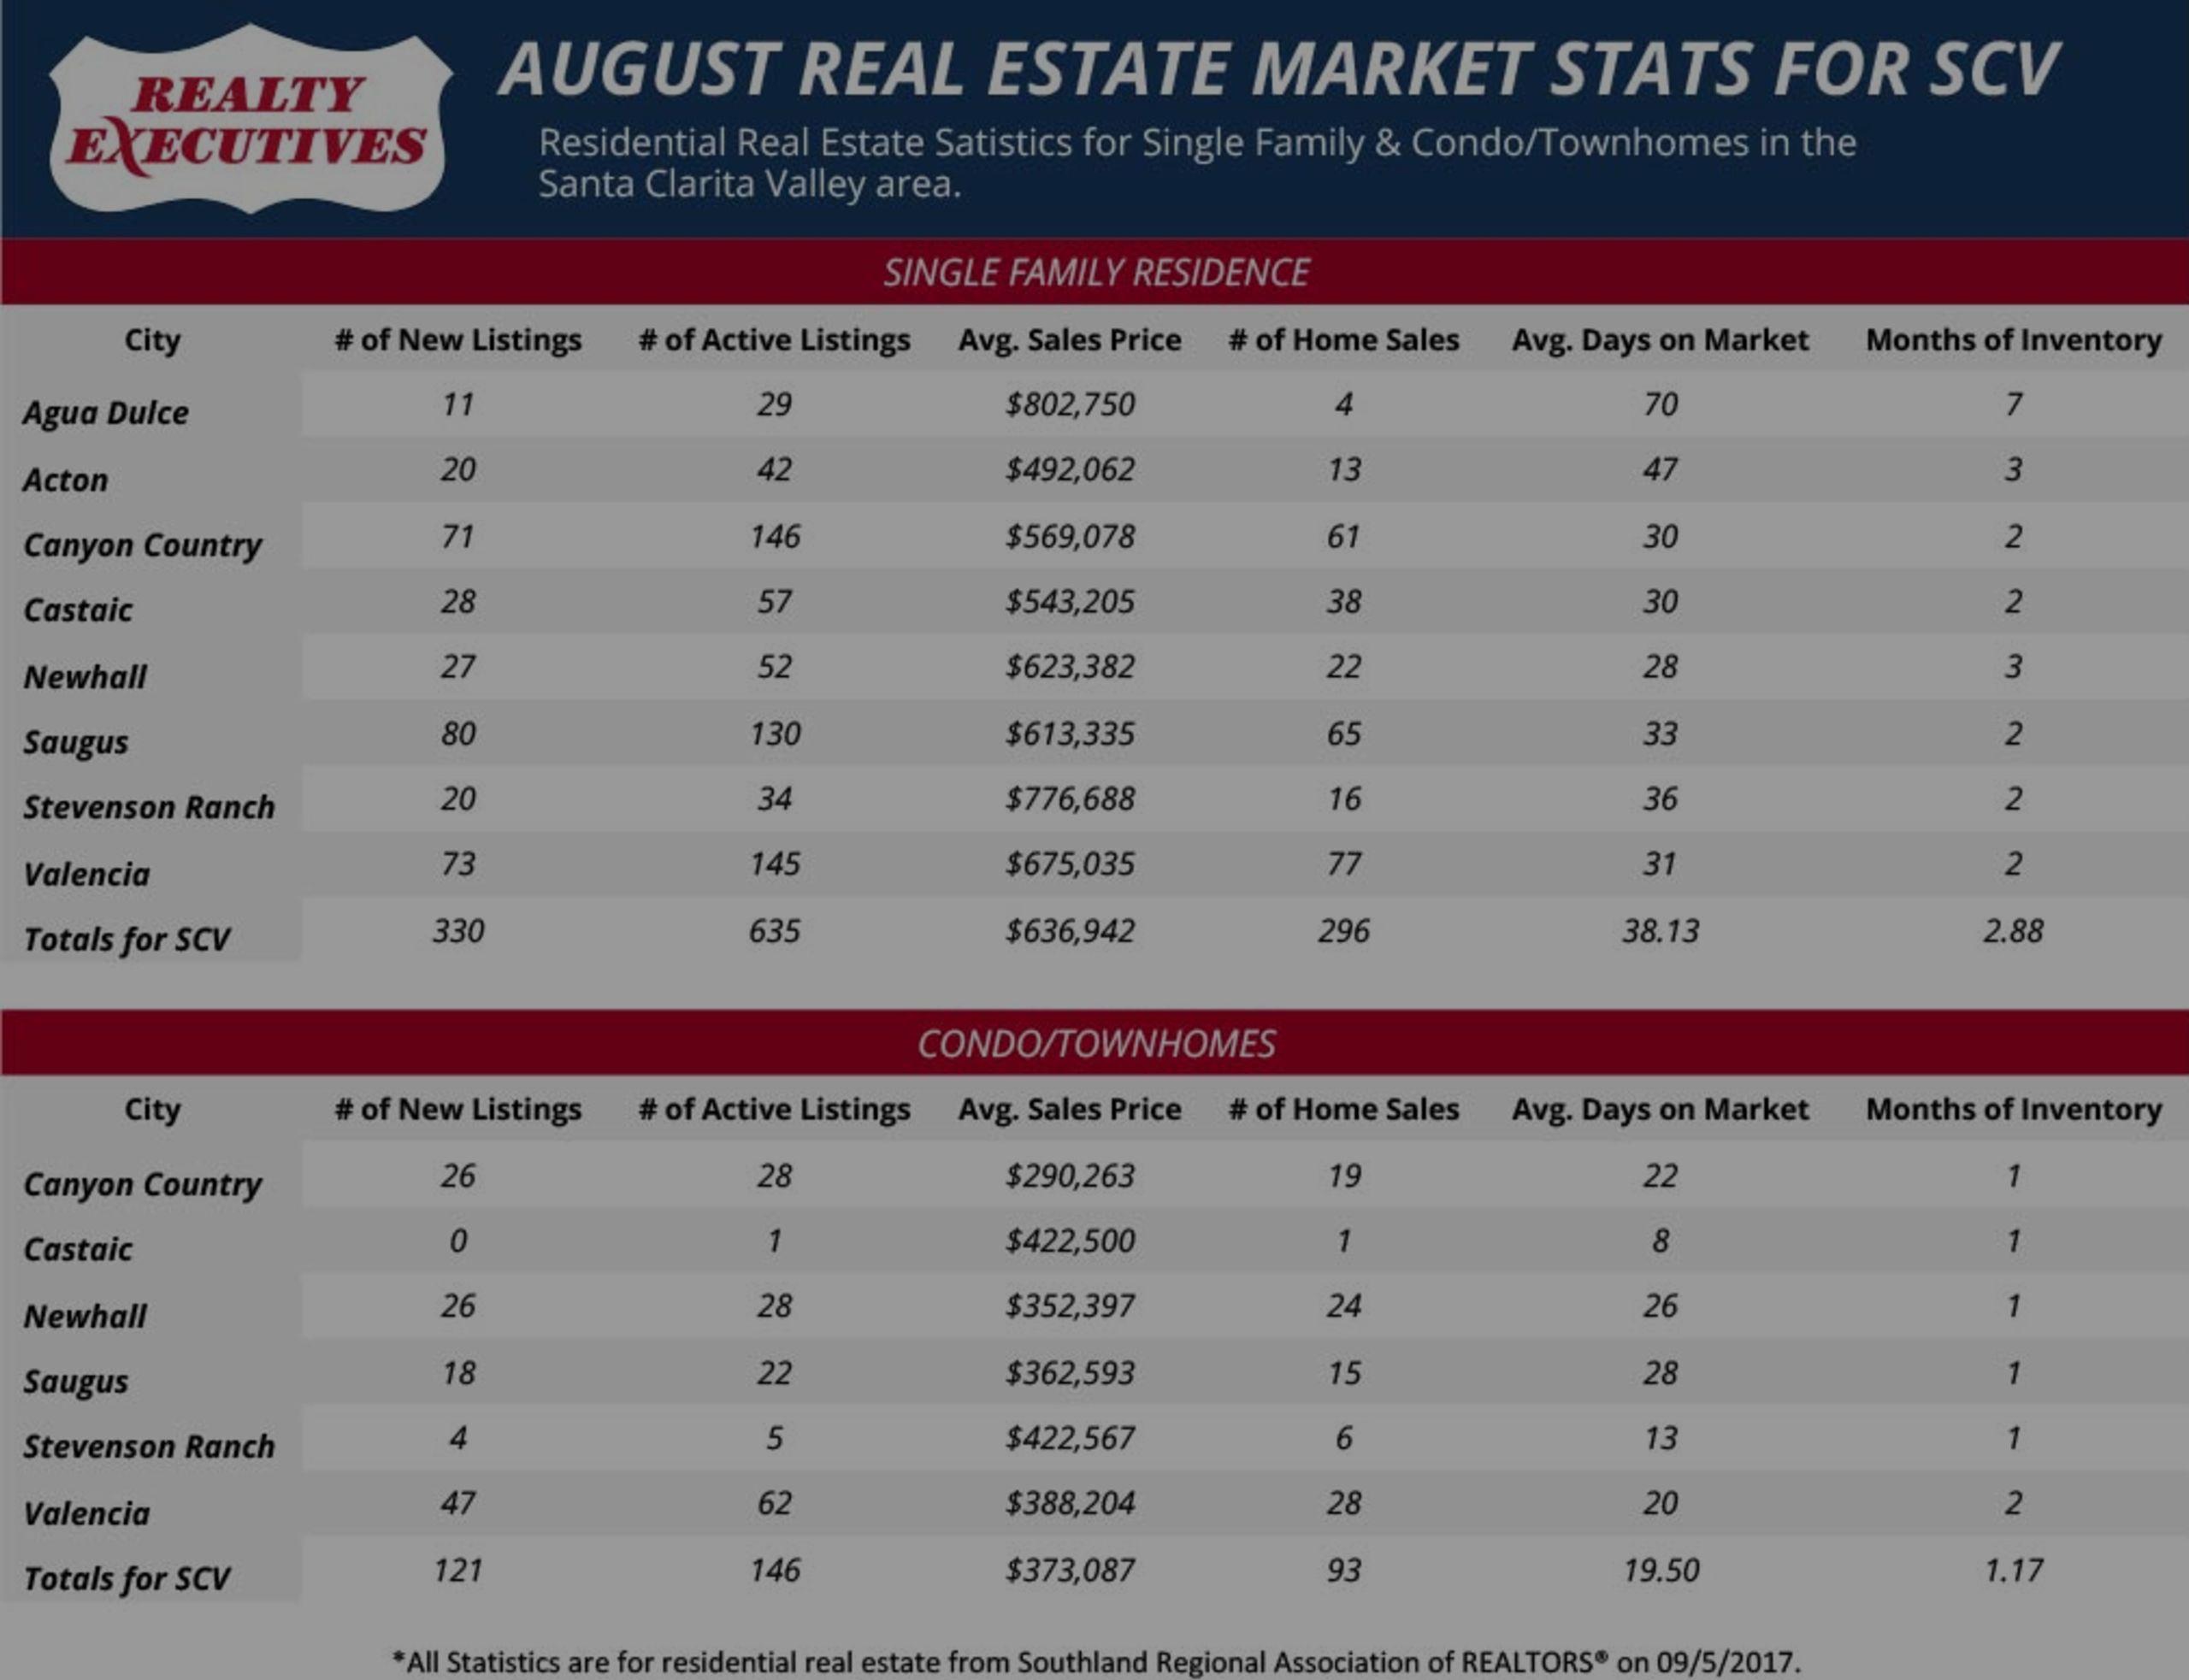 August 2017: Santa Clarita Real Estate Market Statistics